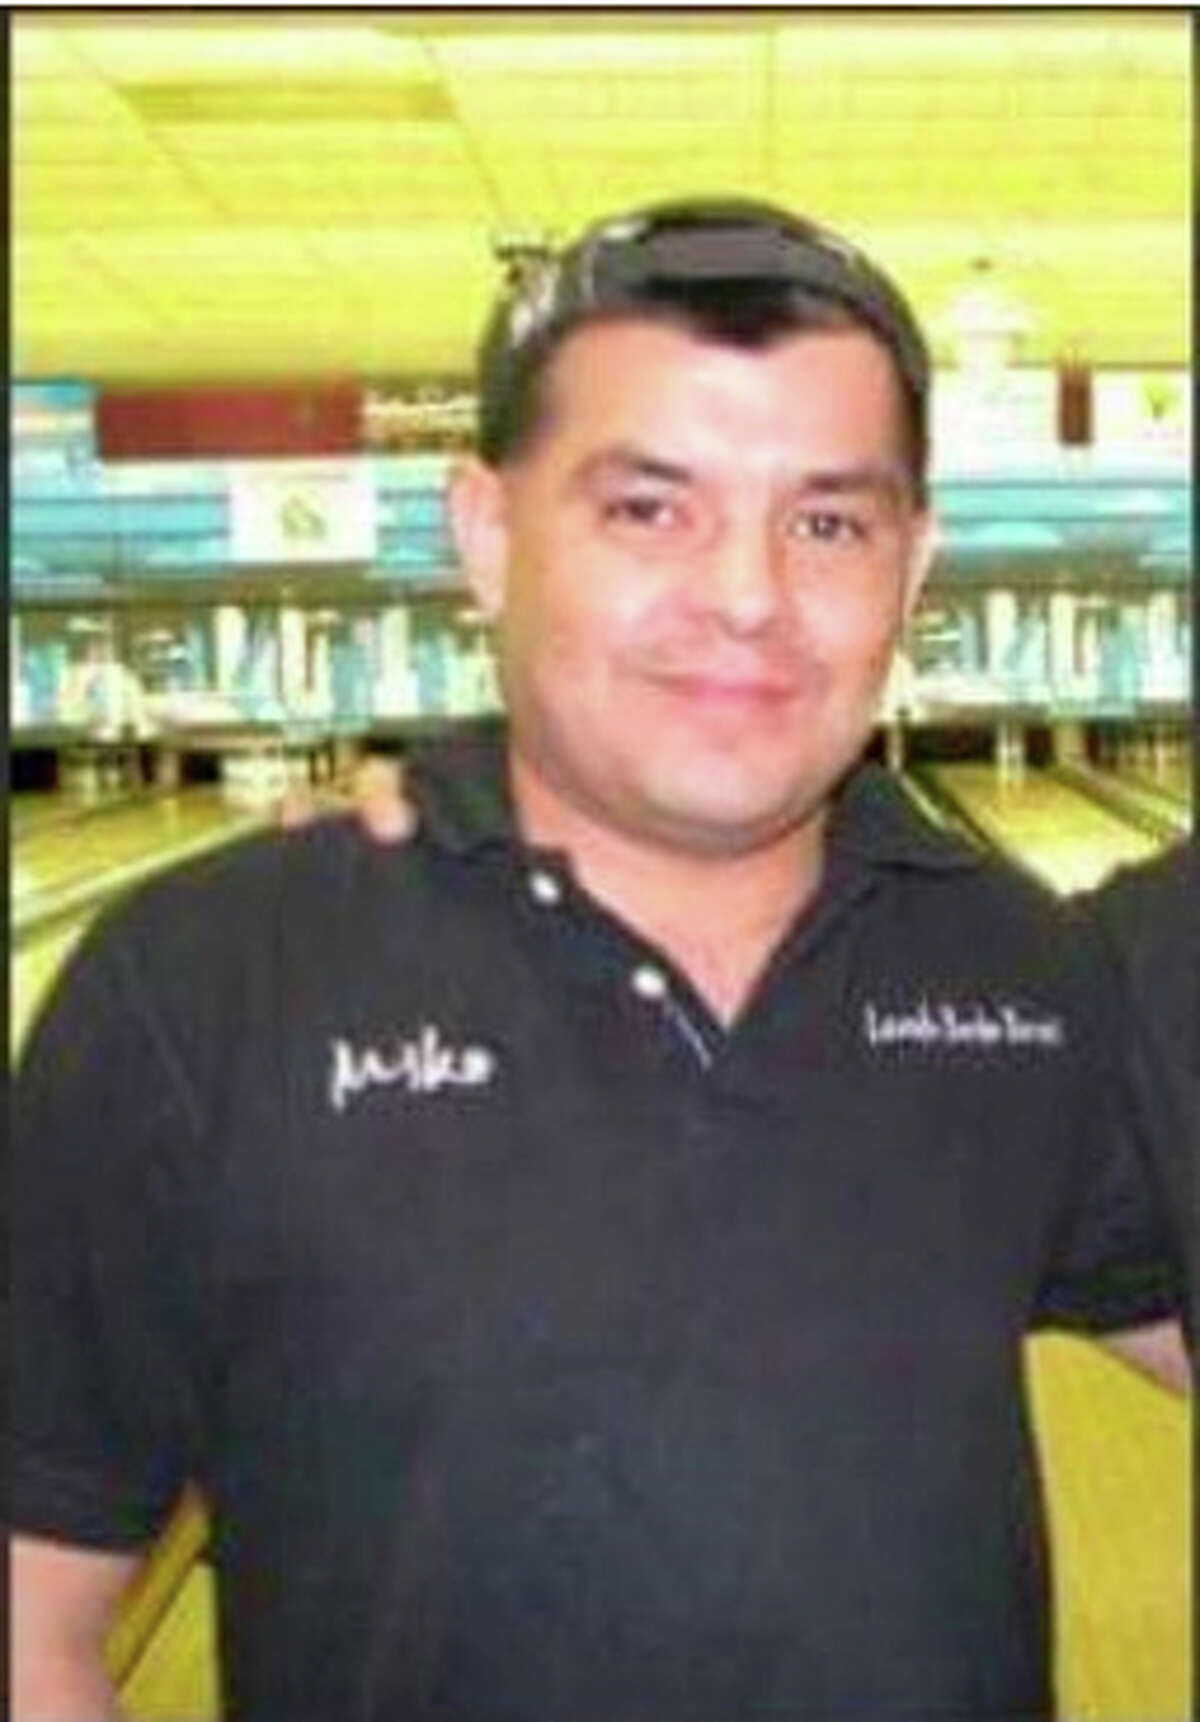 Life-long resident of Laredo, Castillo, 46, passed away on Monday, September 17, 2018, at a local hospital.